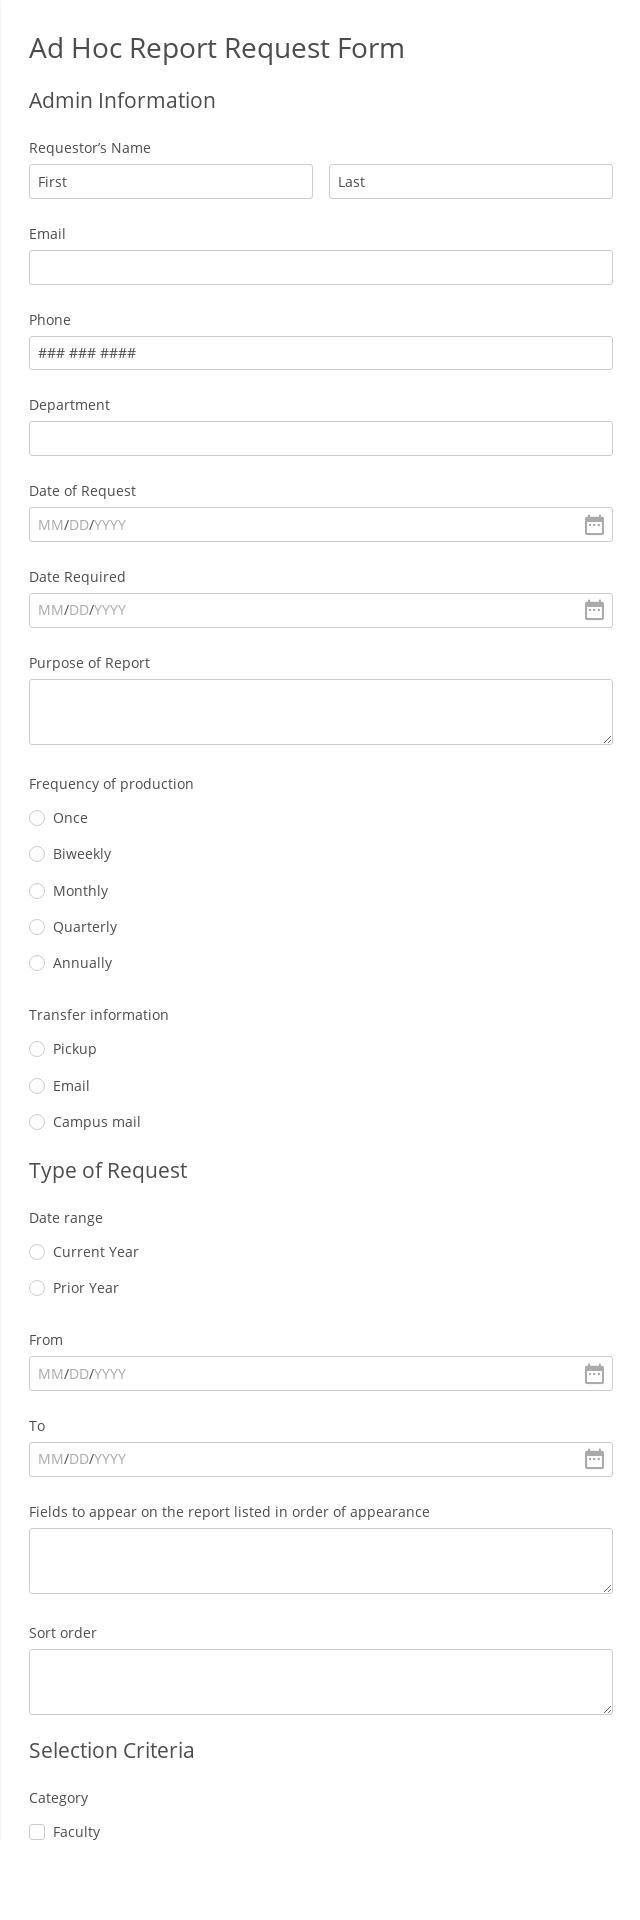 Ad Hoc Report Request Form